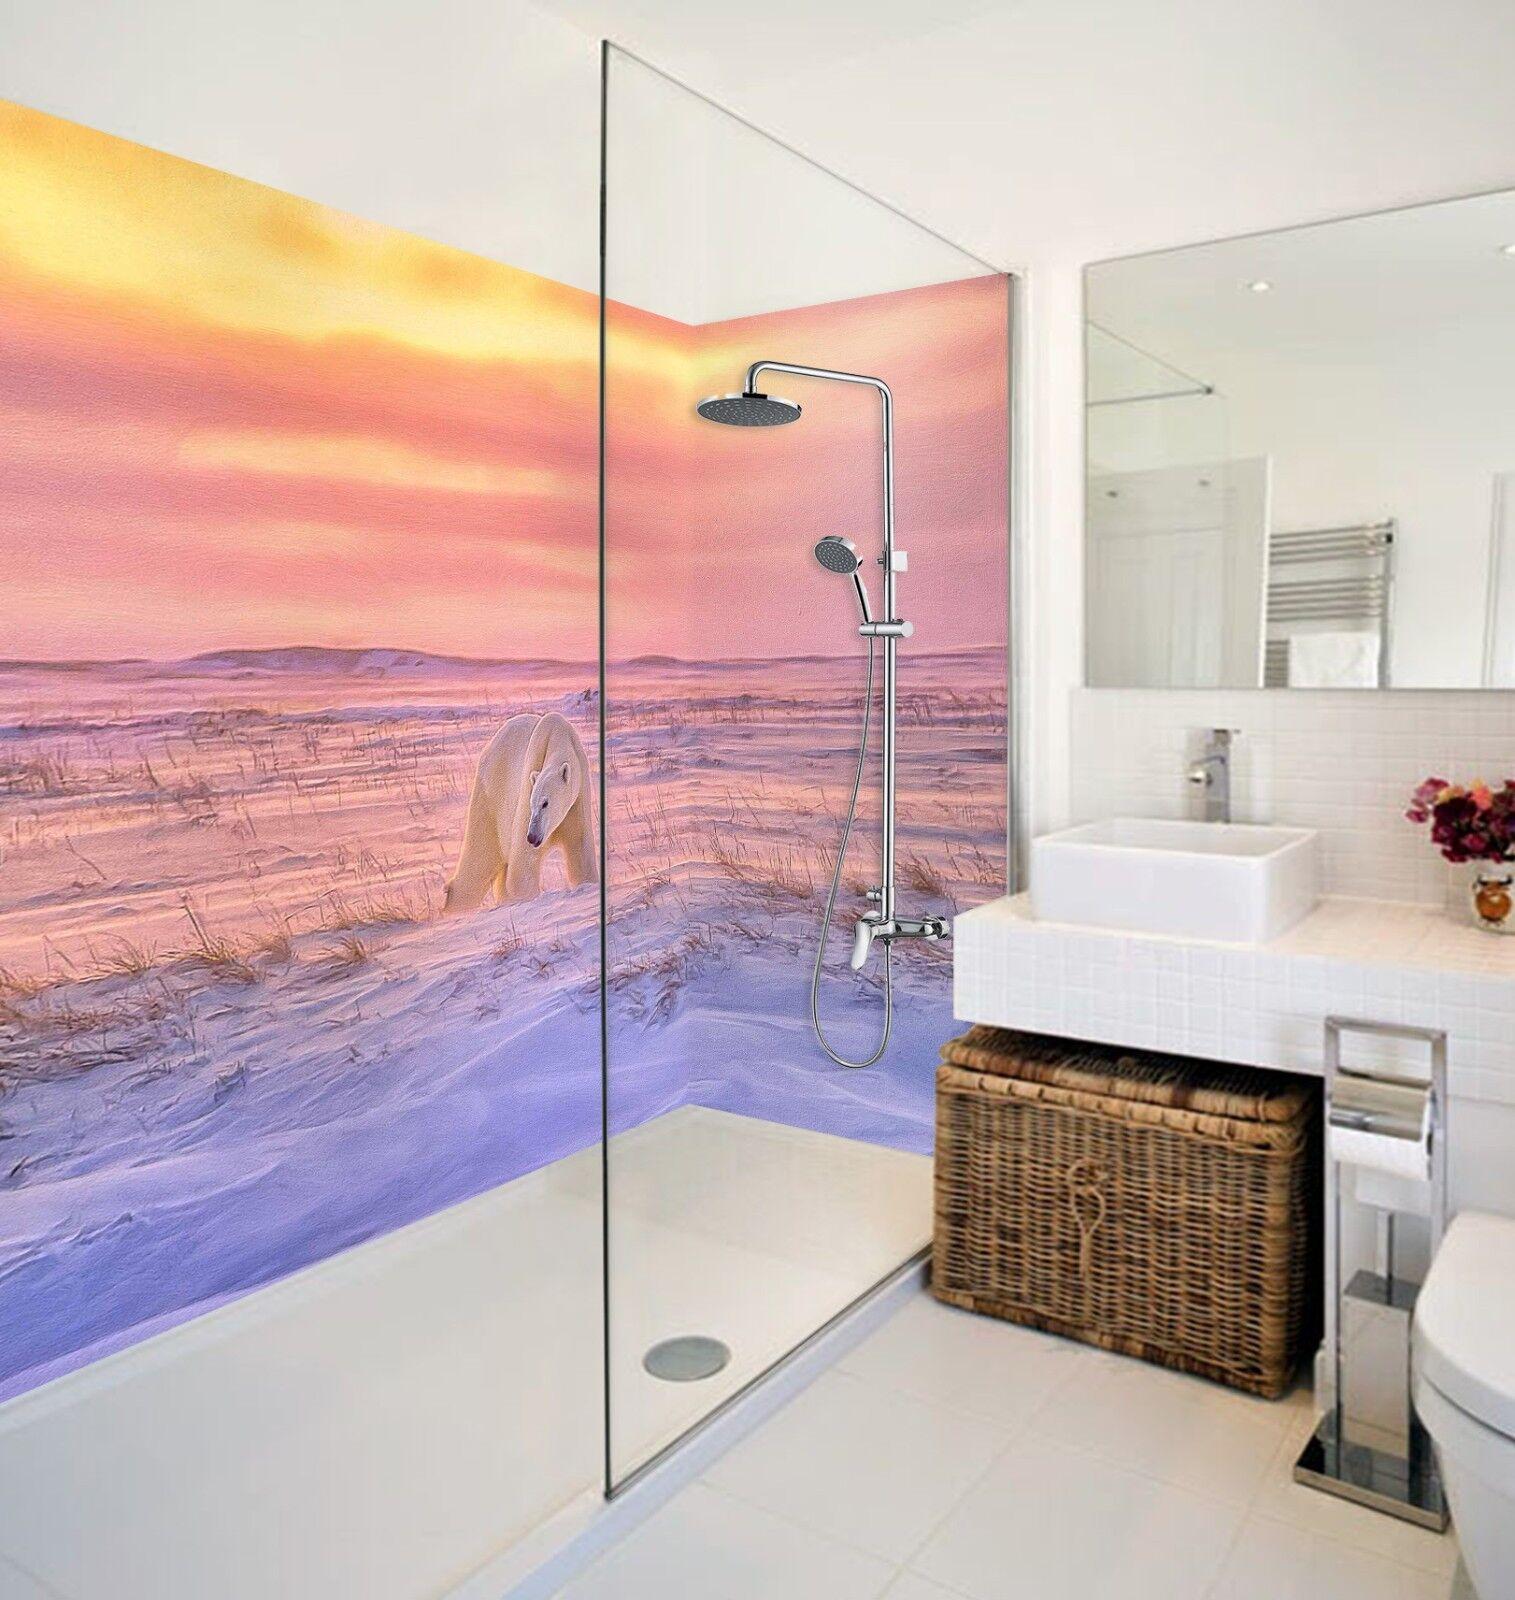 3D Snow Polar Bear 424 WallPaper Bathroom Print Decal Wall Deco AJ WALLPAPER AU